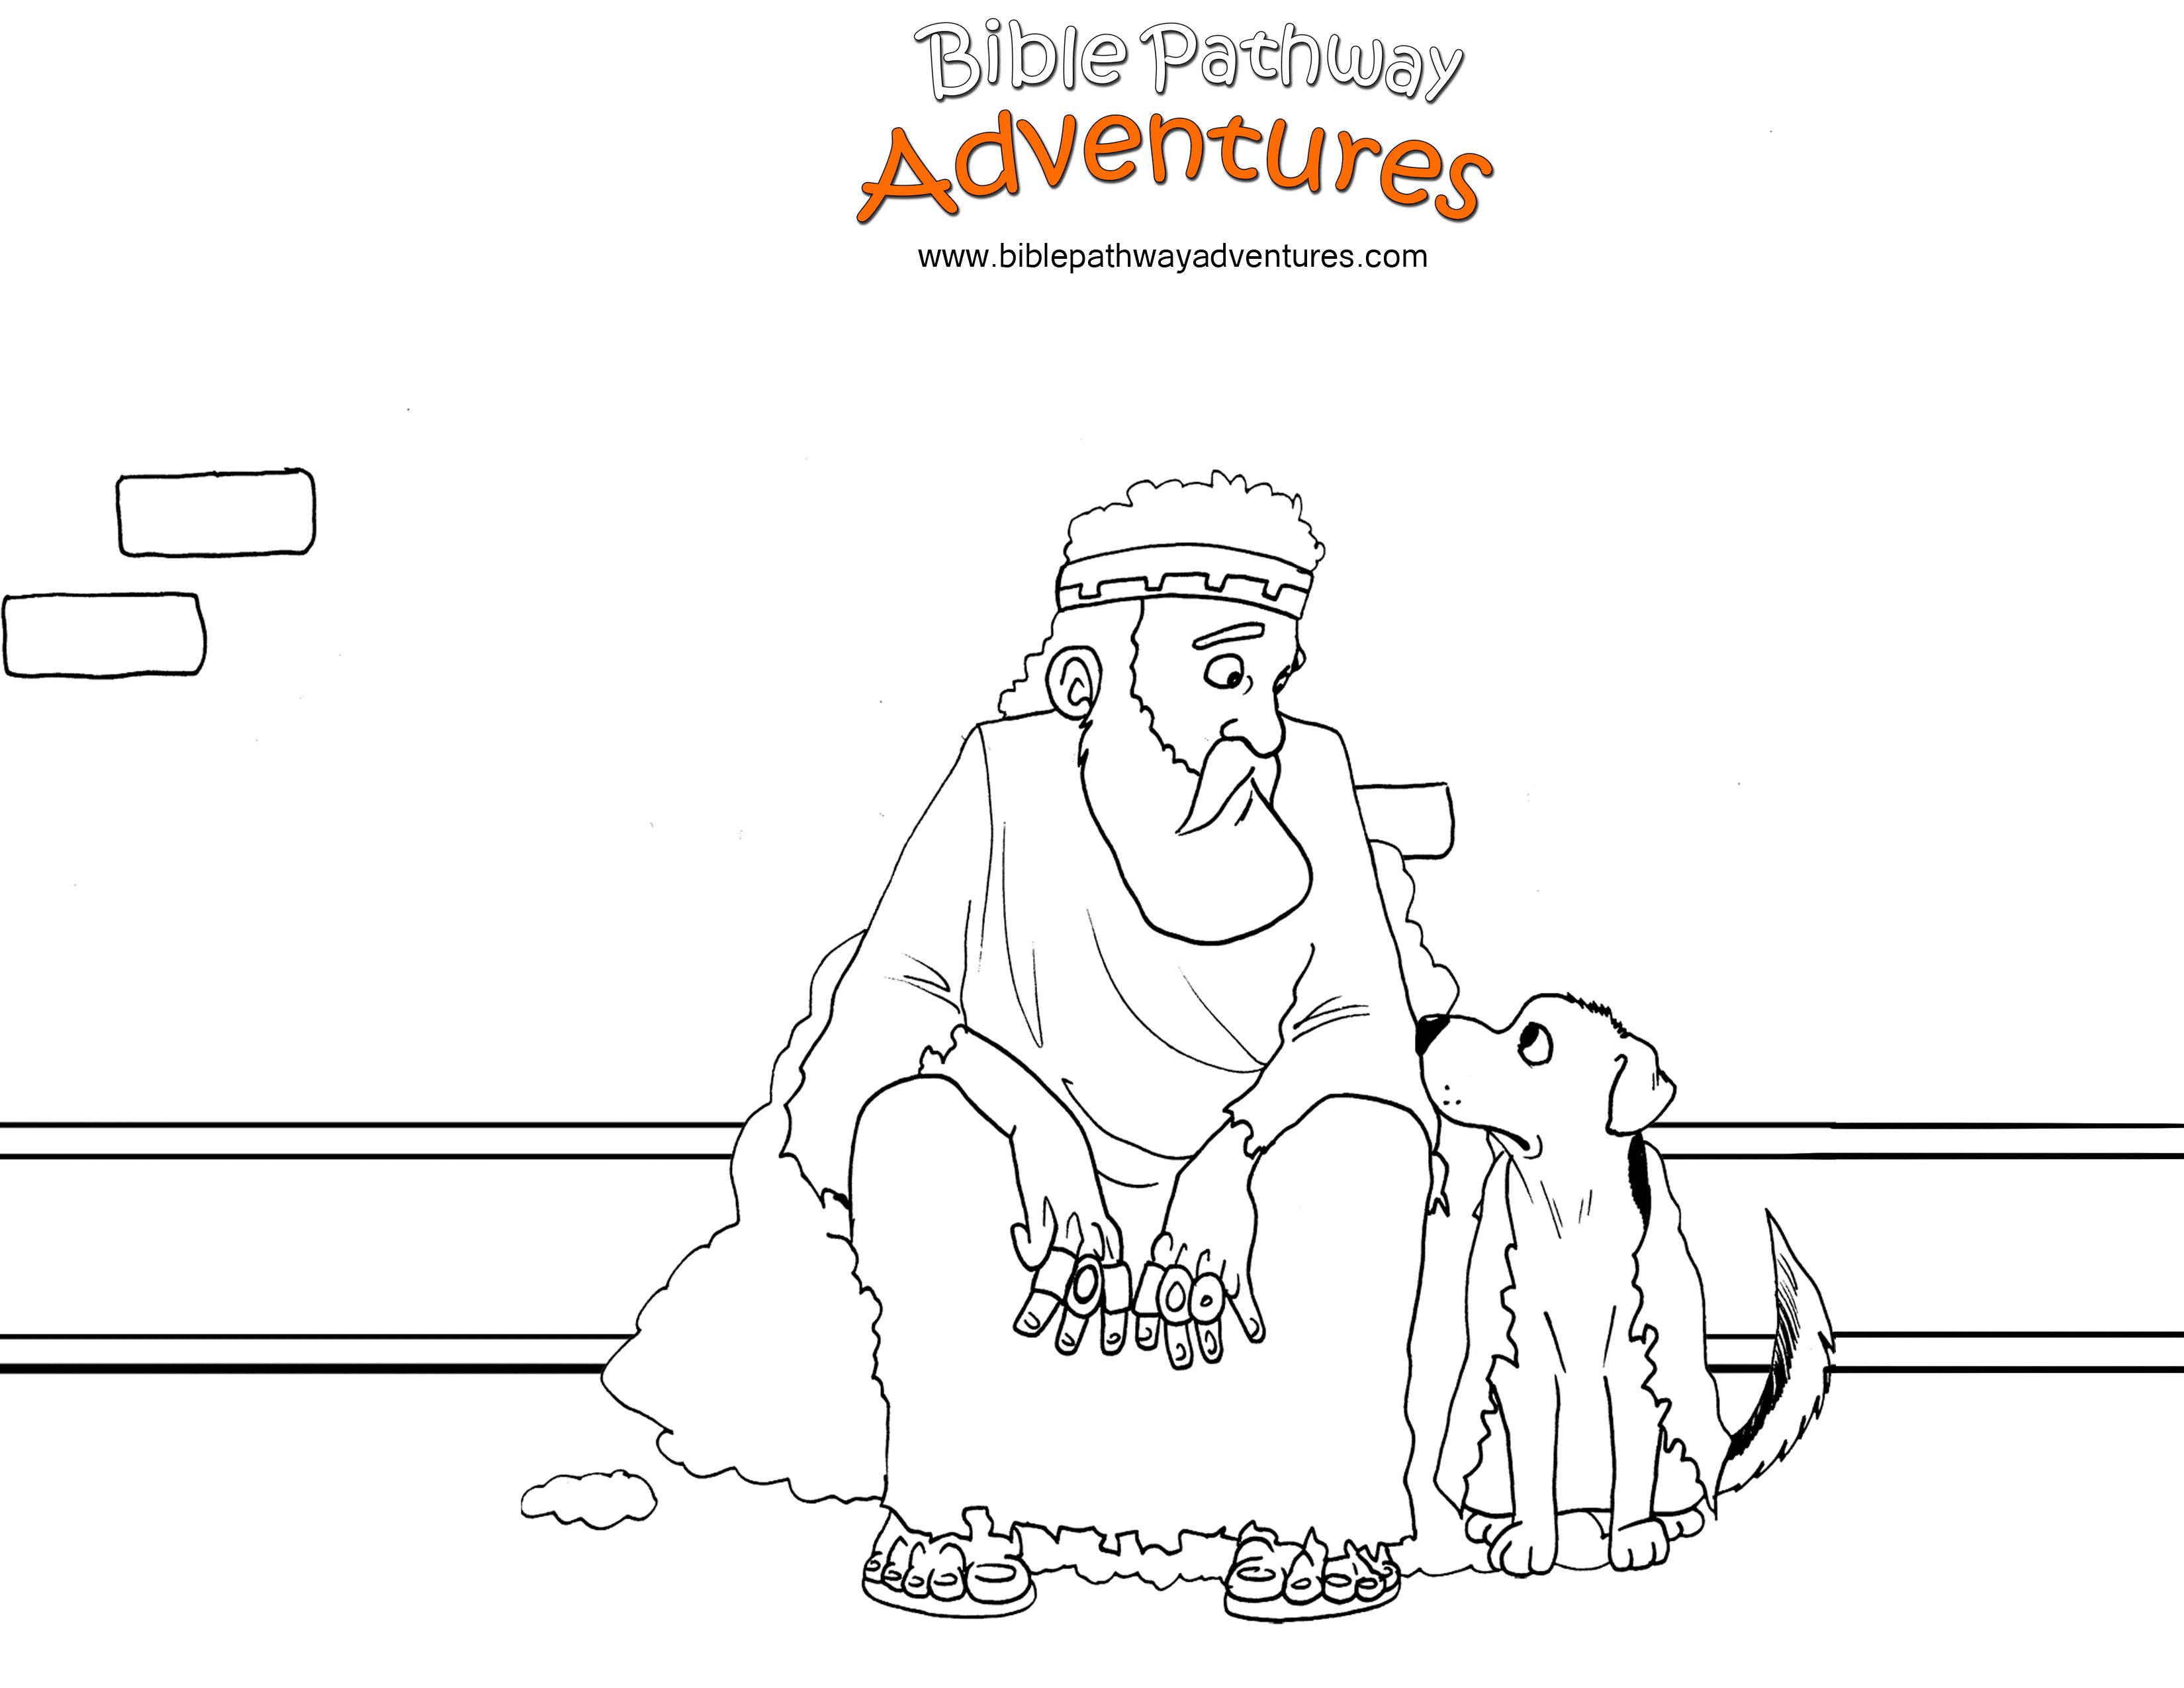 King of Nineveh Repents Bible Pathway Adventures